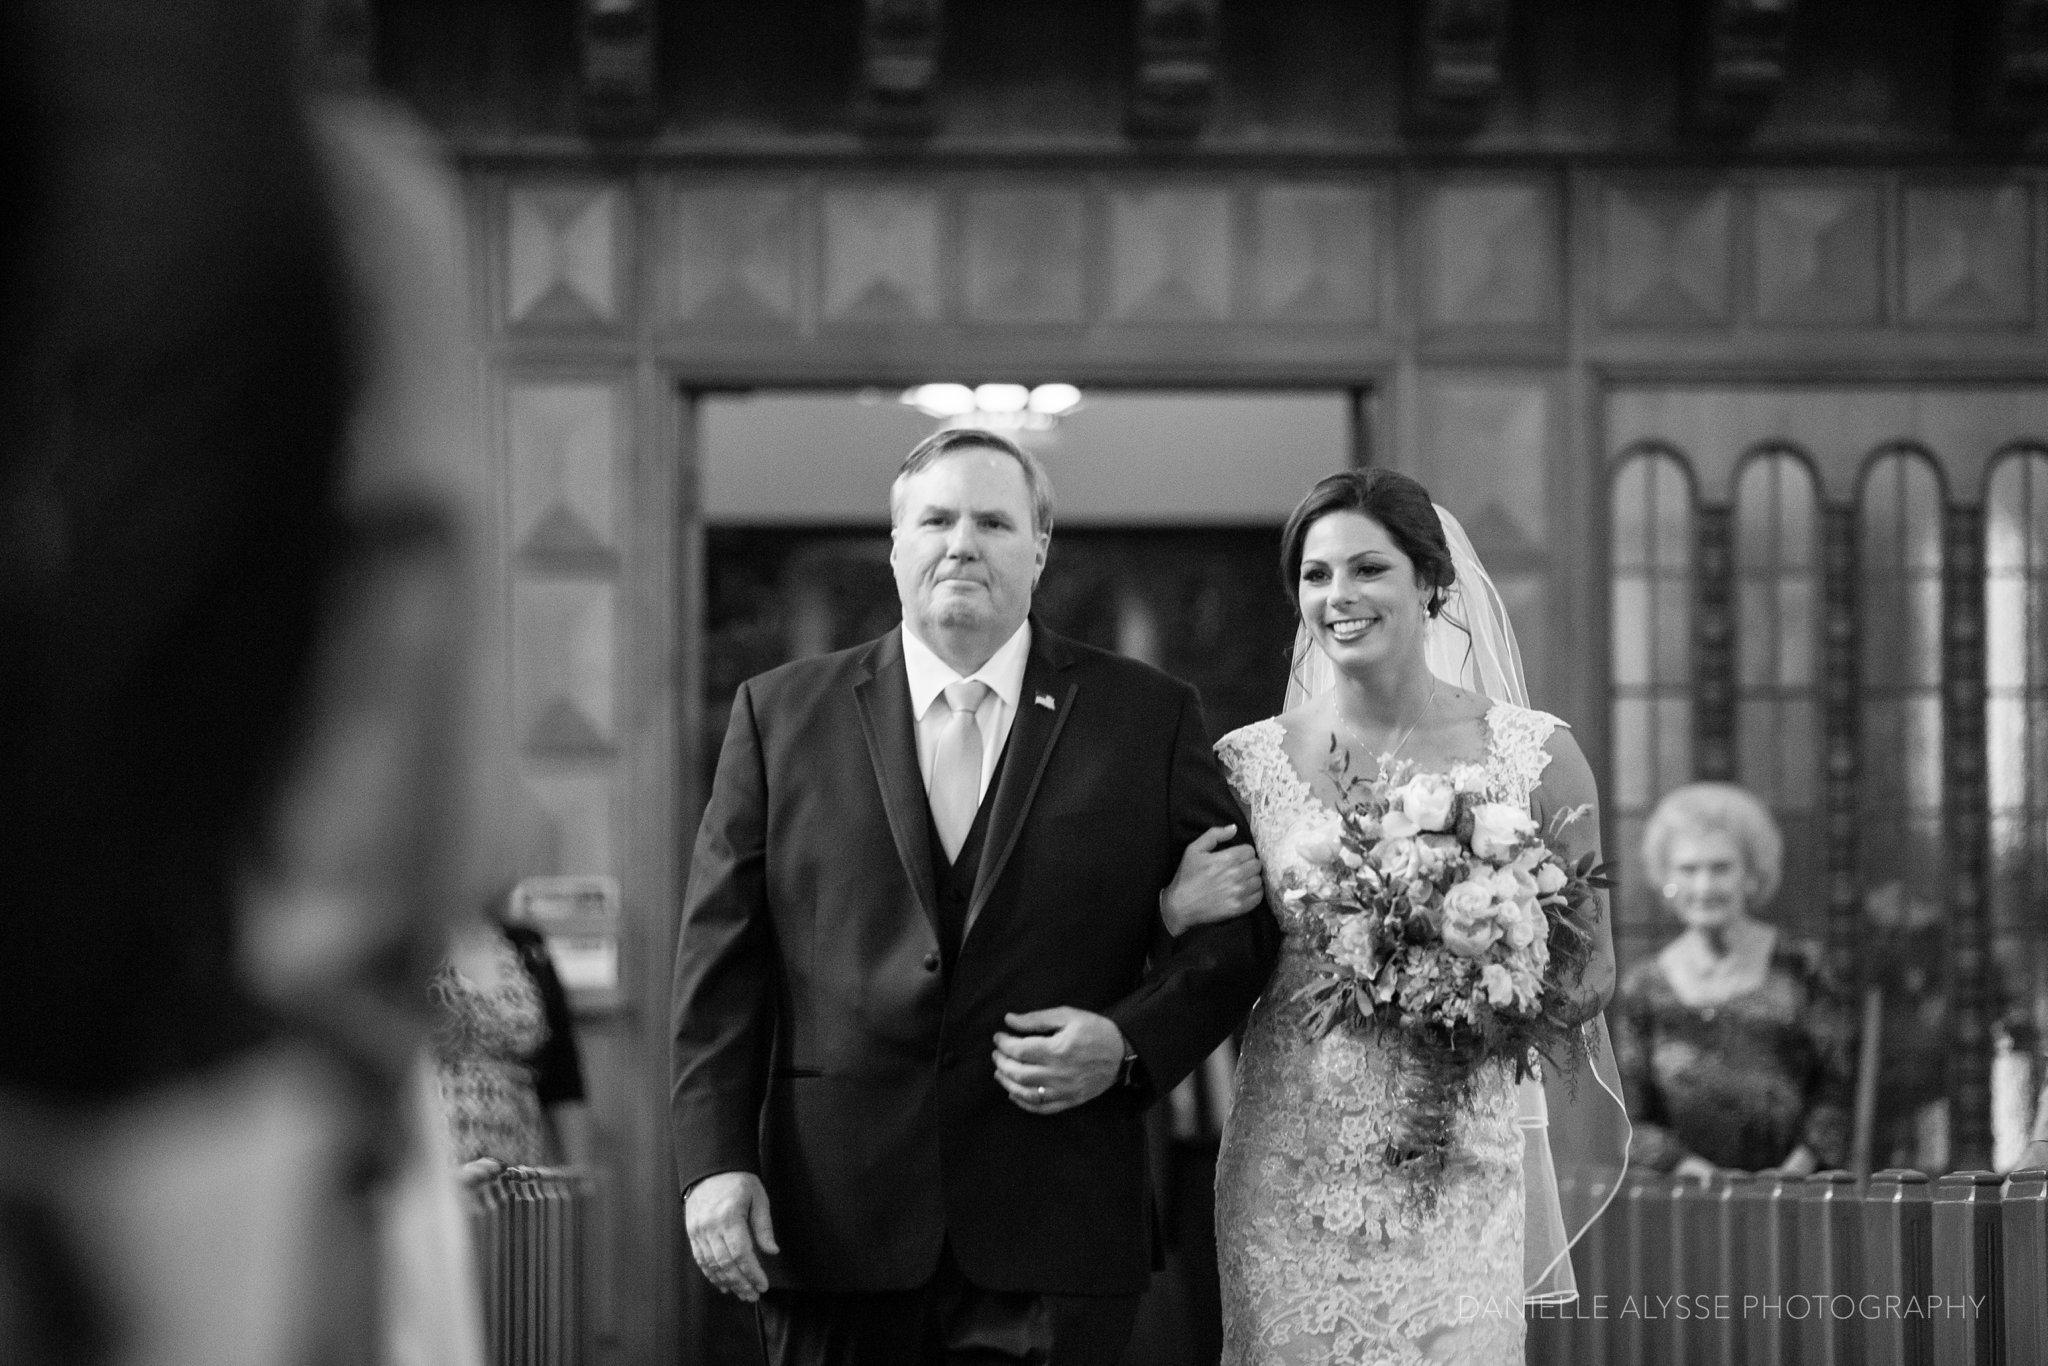 170429_blog_kimberly_ben_wedding_san_mateo_curiodyssey_danielle_alysse_photography_sacramento_photographer0480_WEB.jpg